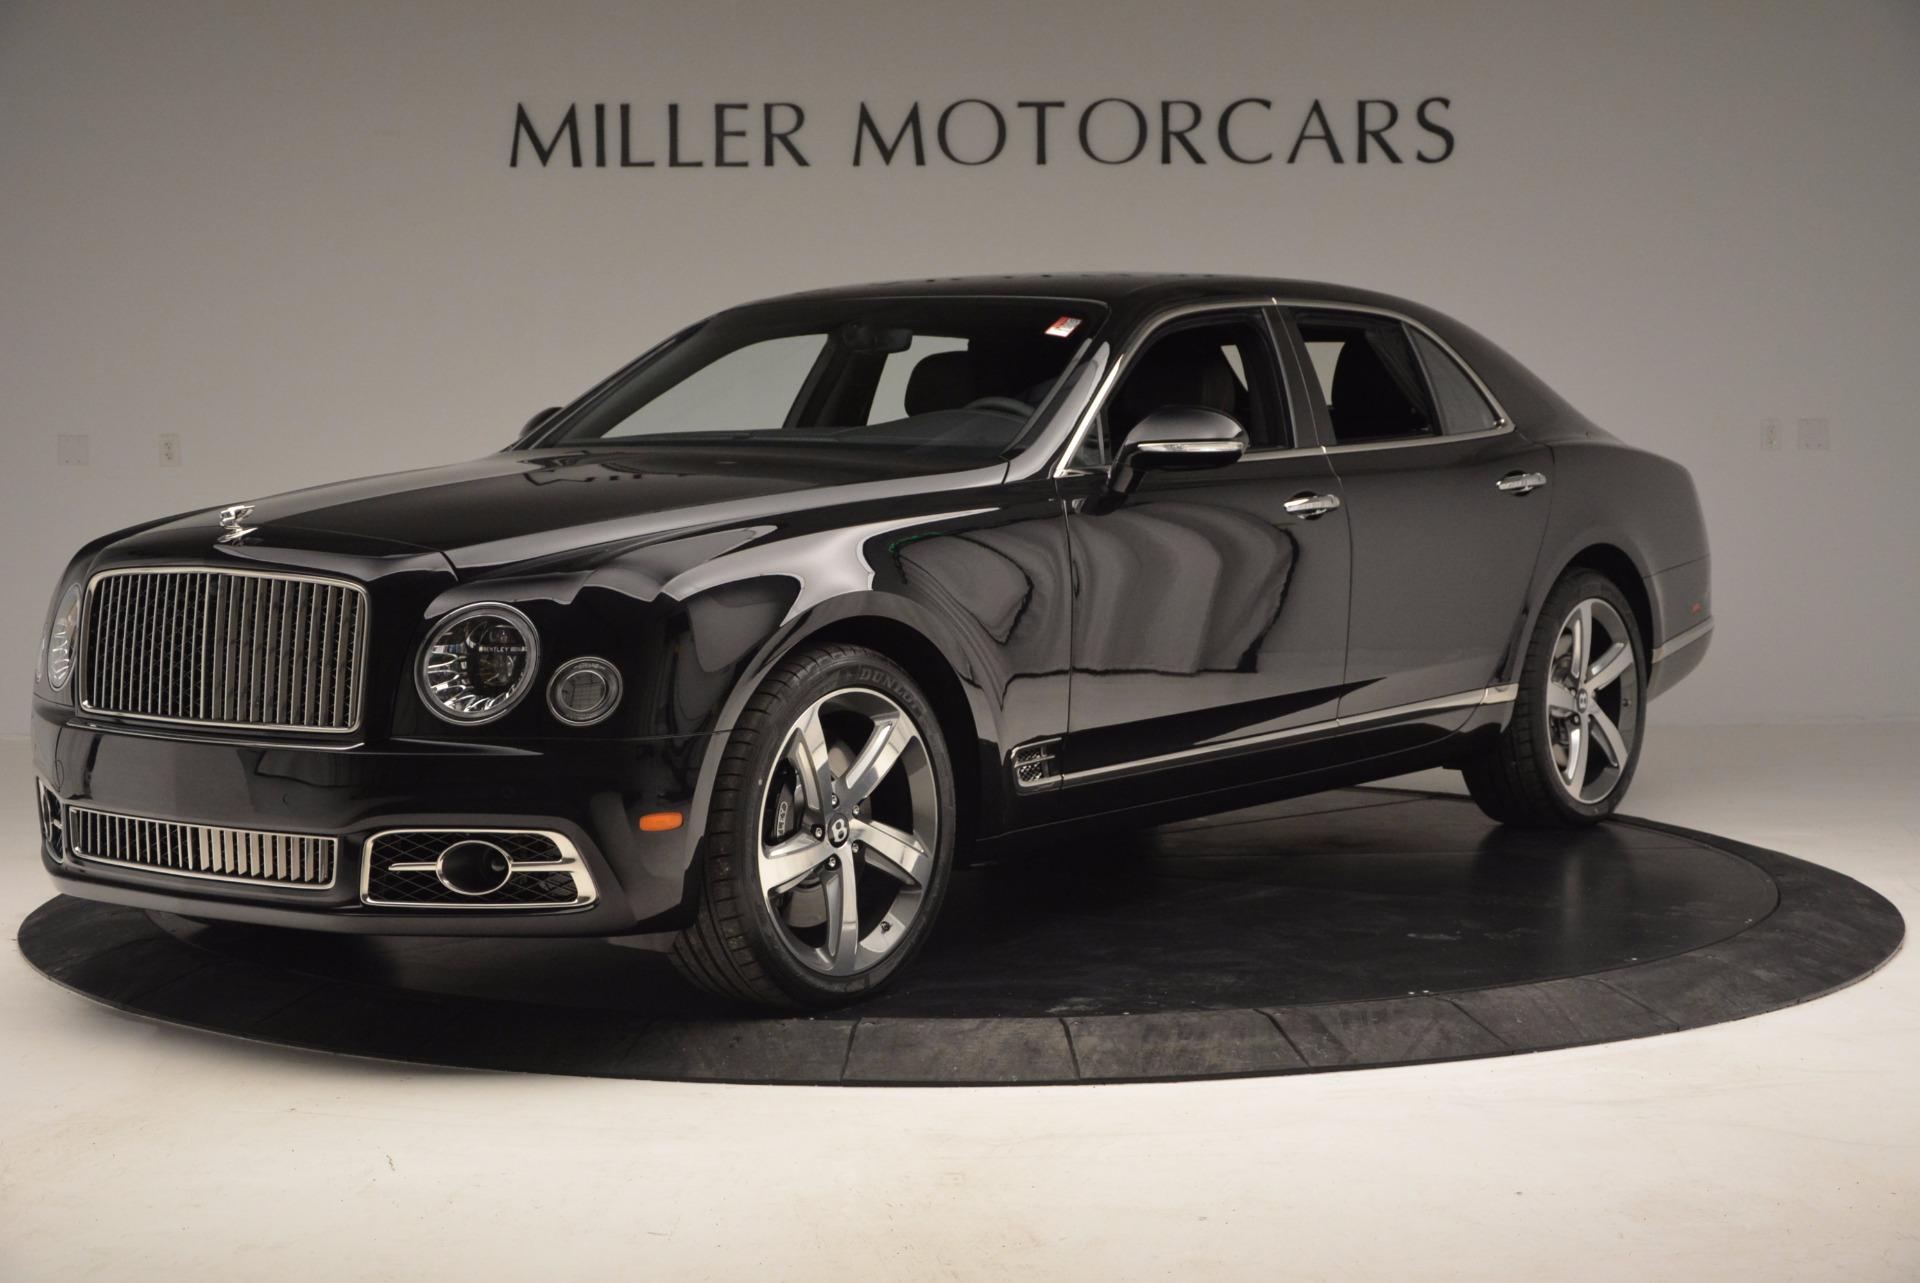 Used 2017 Bentley Mulsanne Speed For Sale In Westport, CT 733_p2